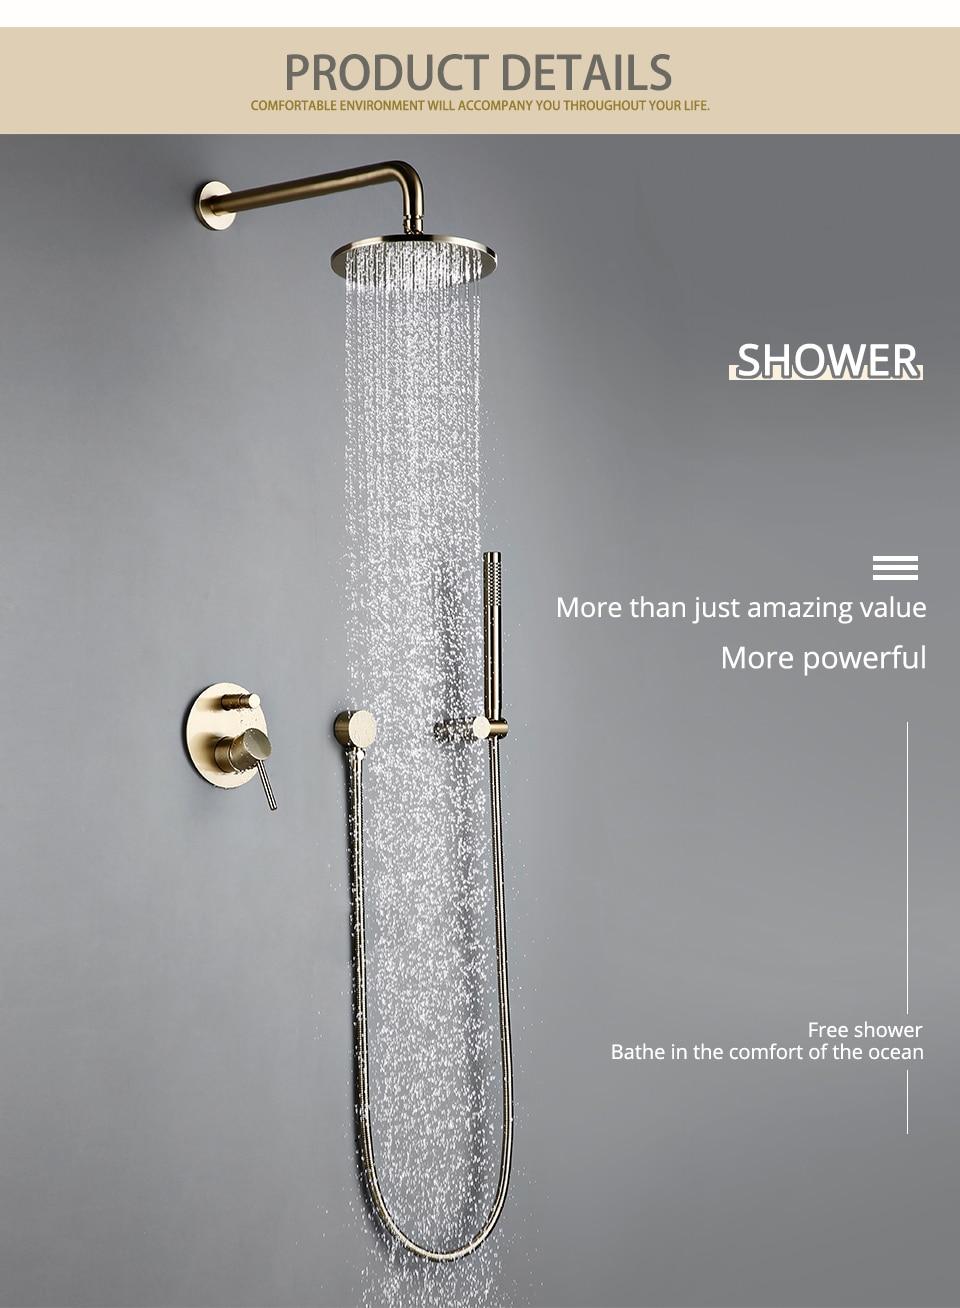 "Hea3da78fae064e28a1b516eacecb6464e Bathroom Bath Faucet Brass Diverter Mixer Tap Set Brushed Gold Rain Fall Valve System Kit Hand held 8-12""Shower Head Wall Arm"